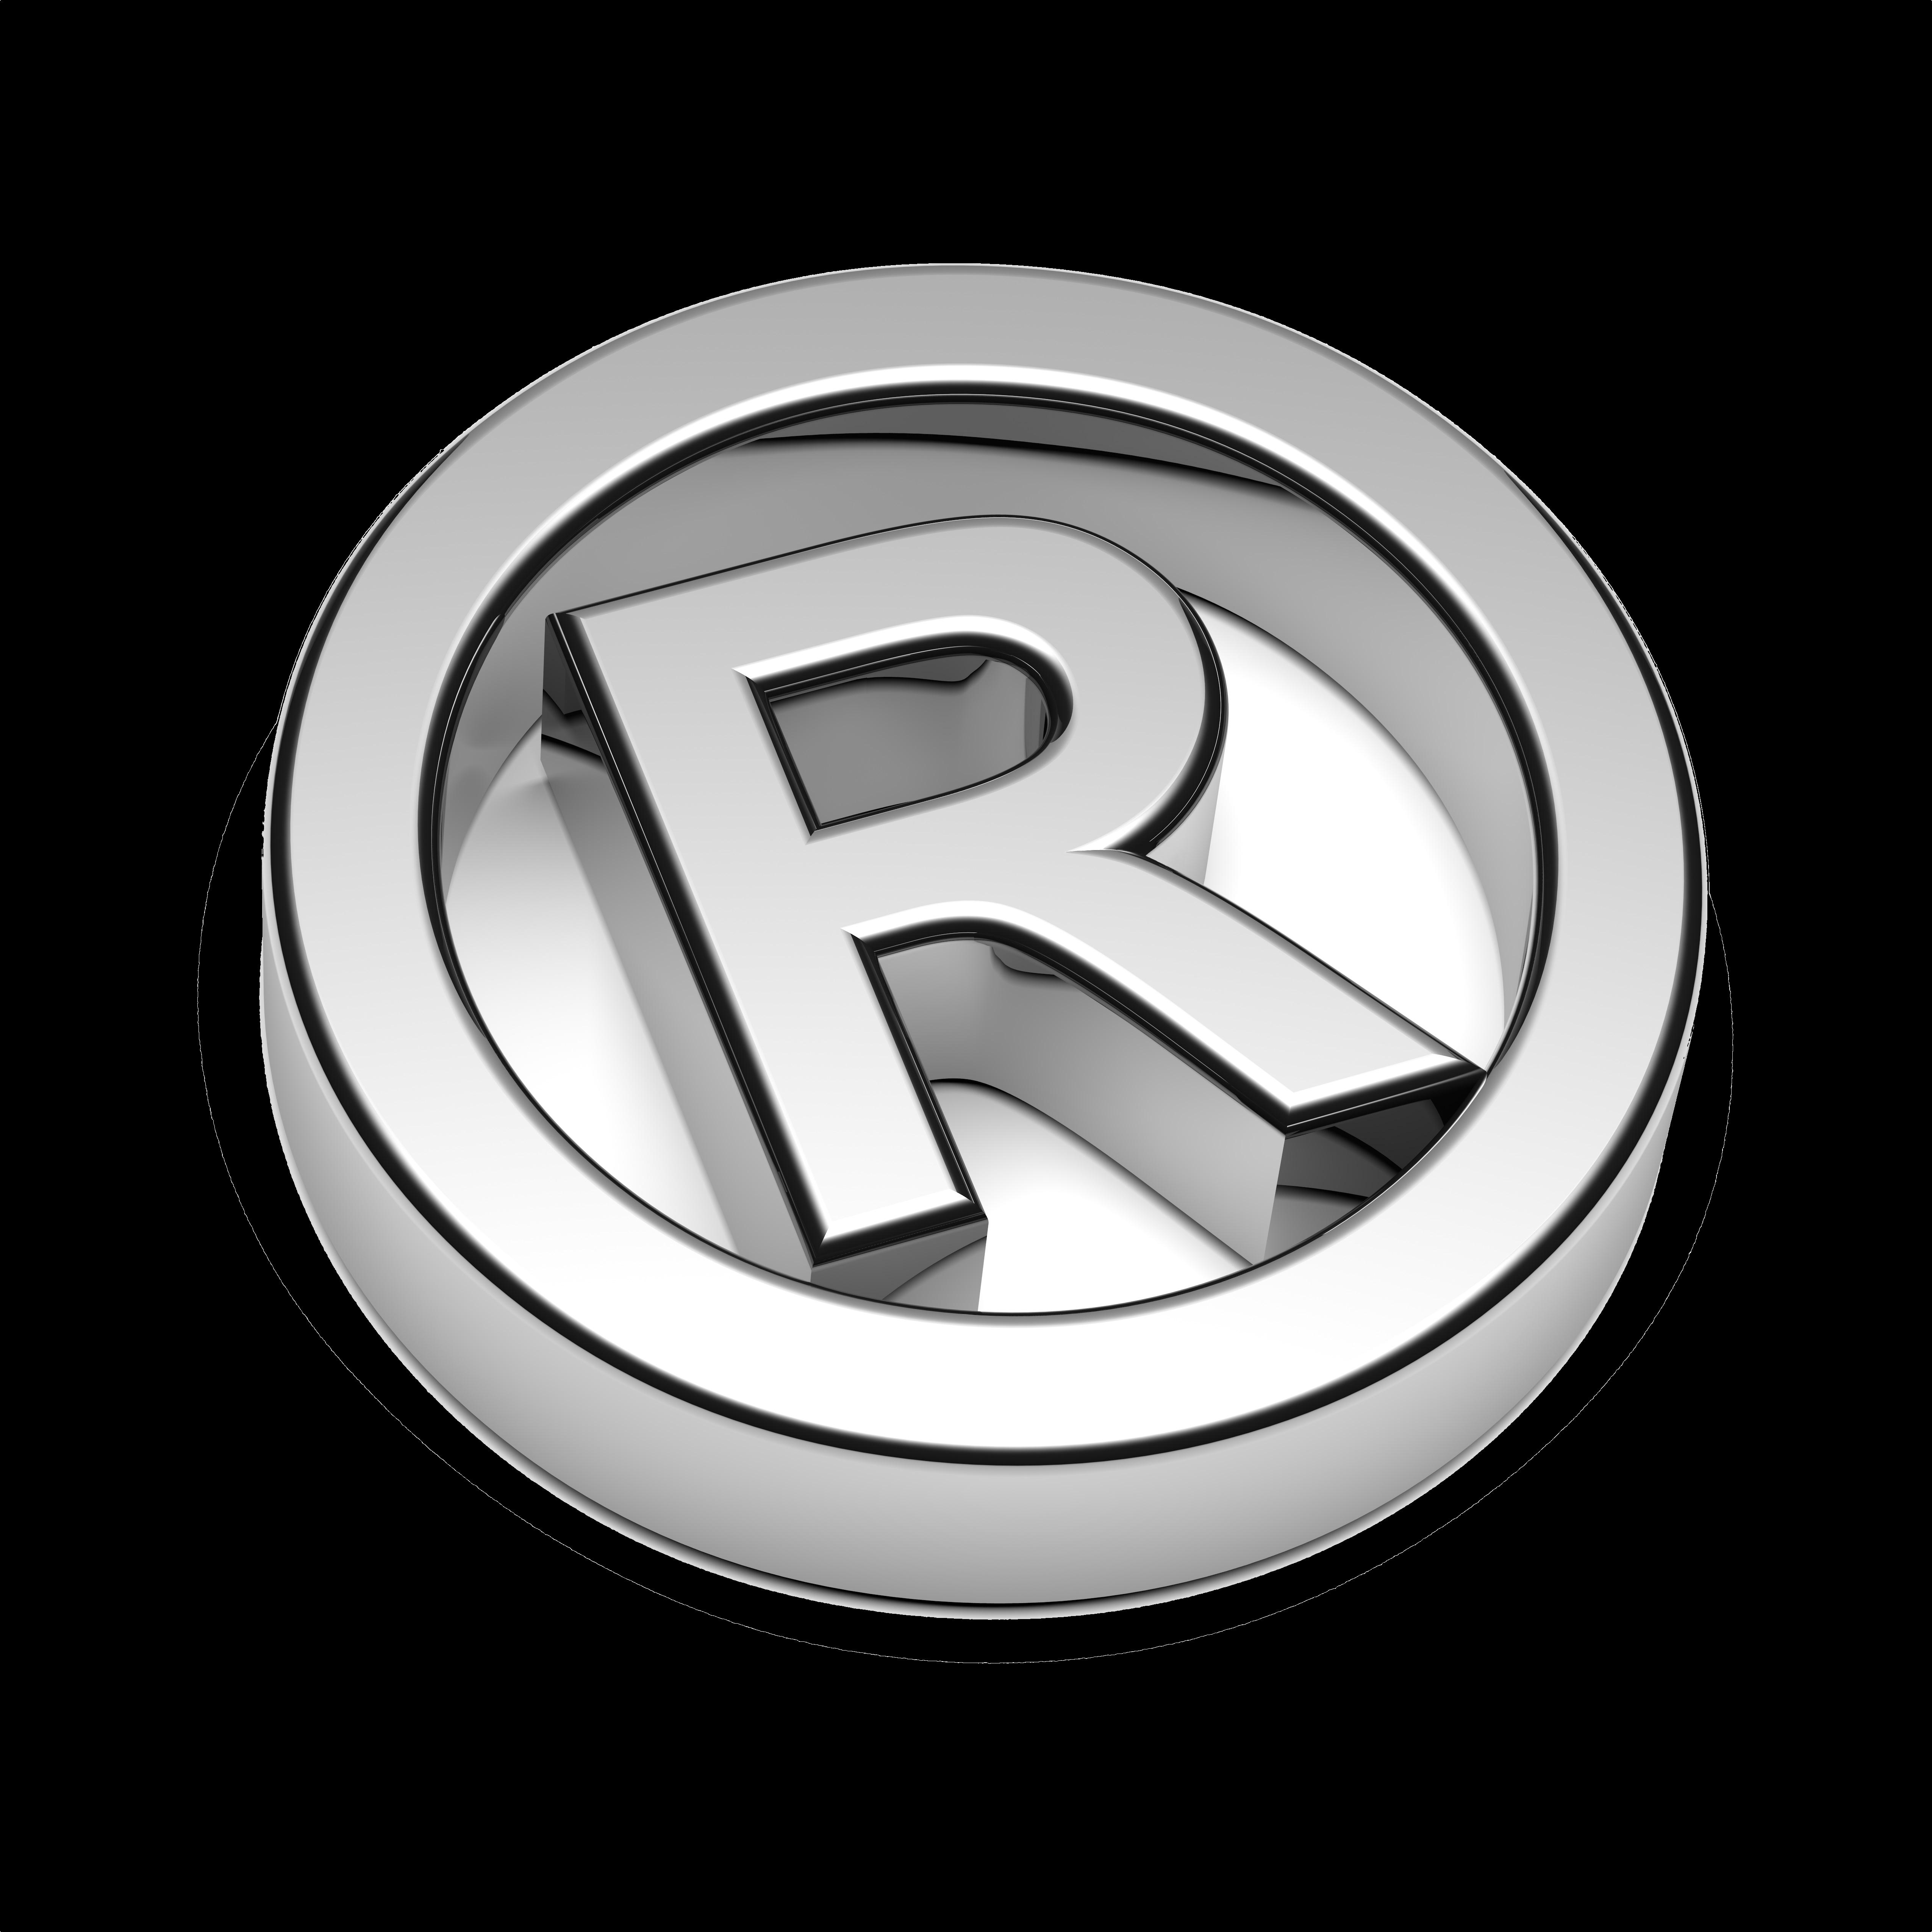 Trademarks - Entertainment Law Offices of Gordon P. Firemark